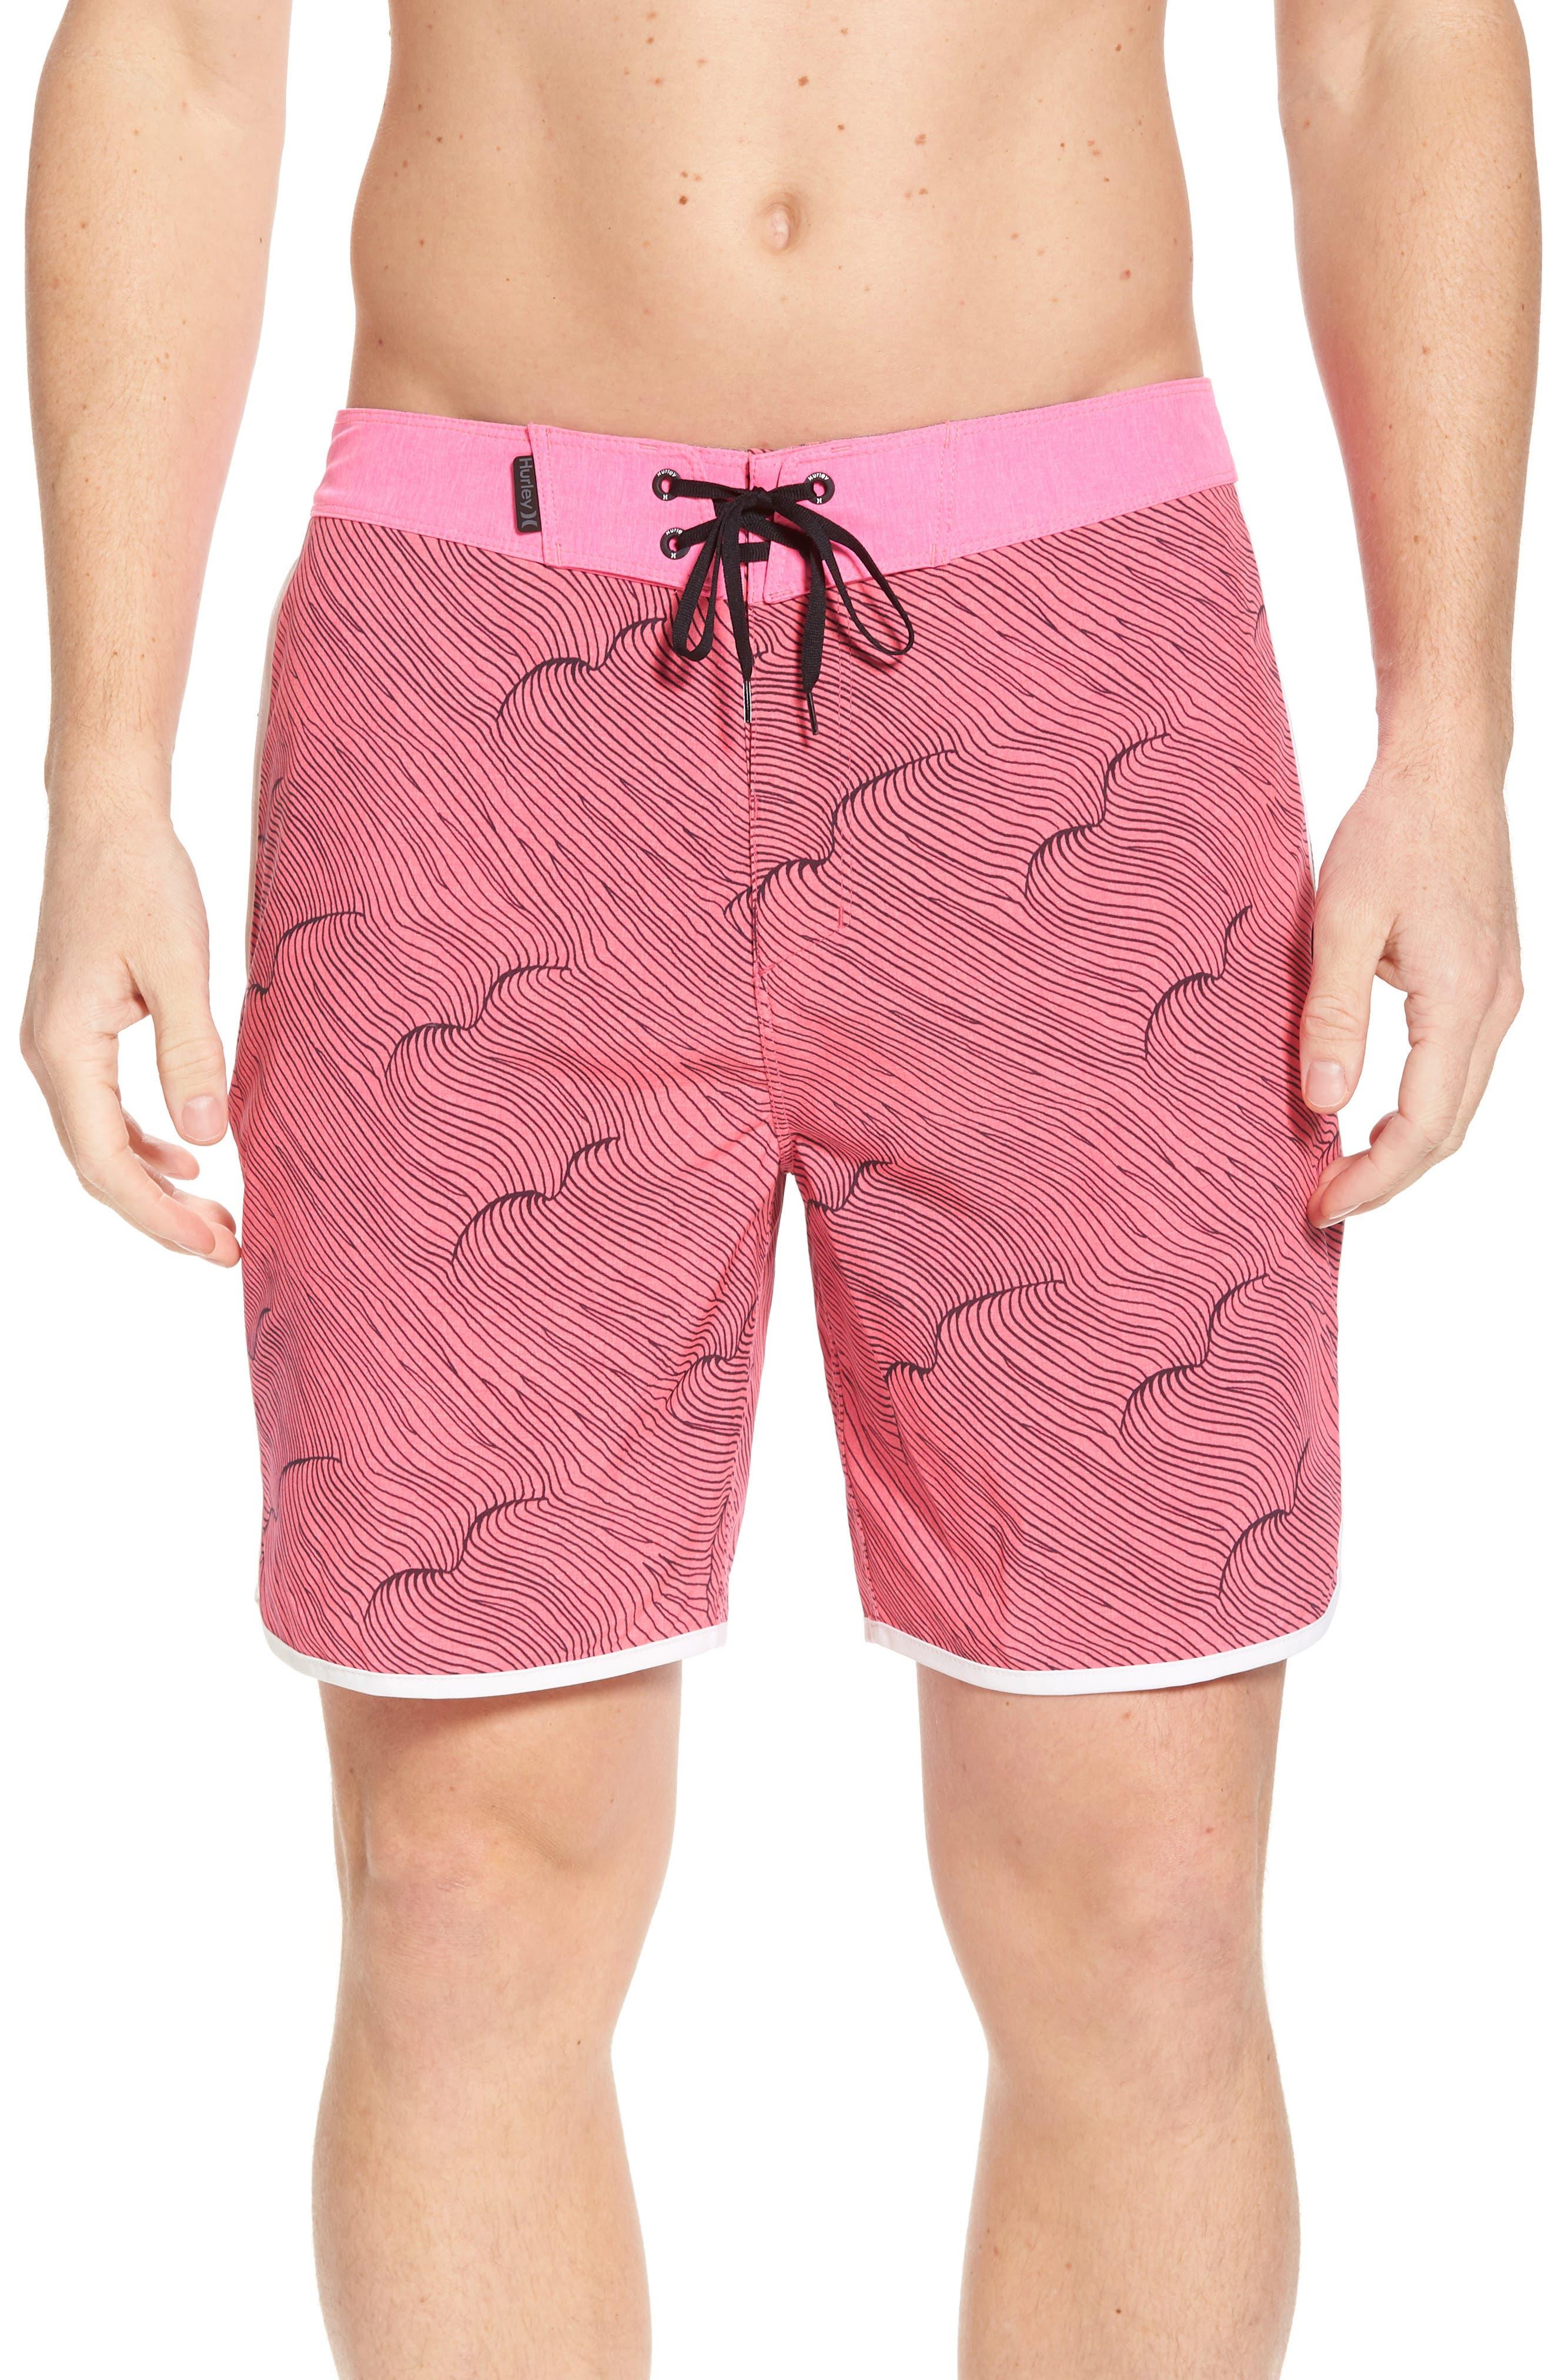 Phantom Thalia Street Board Shorts,                             Main thumbnail 1, color,                             Hyper Pink/Black